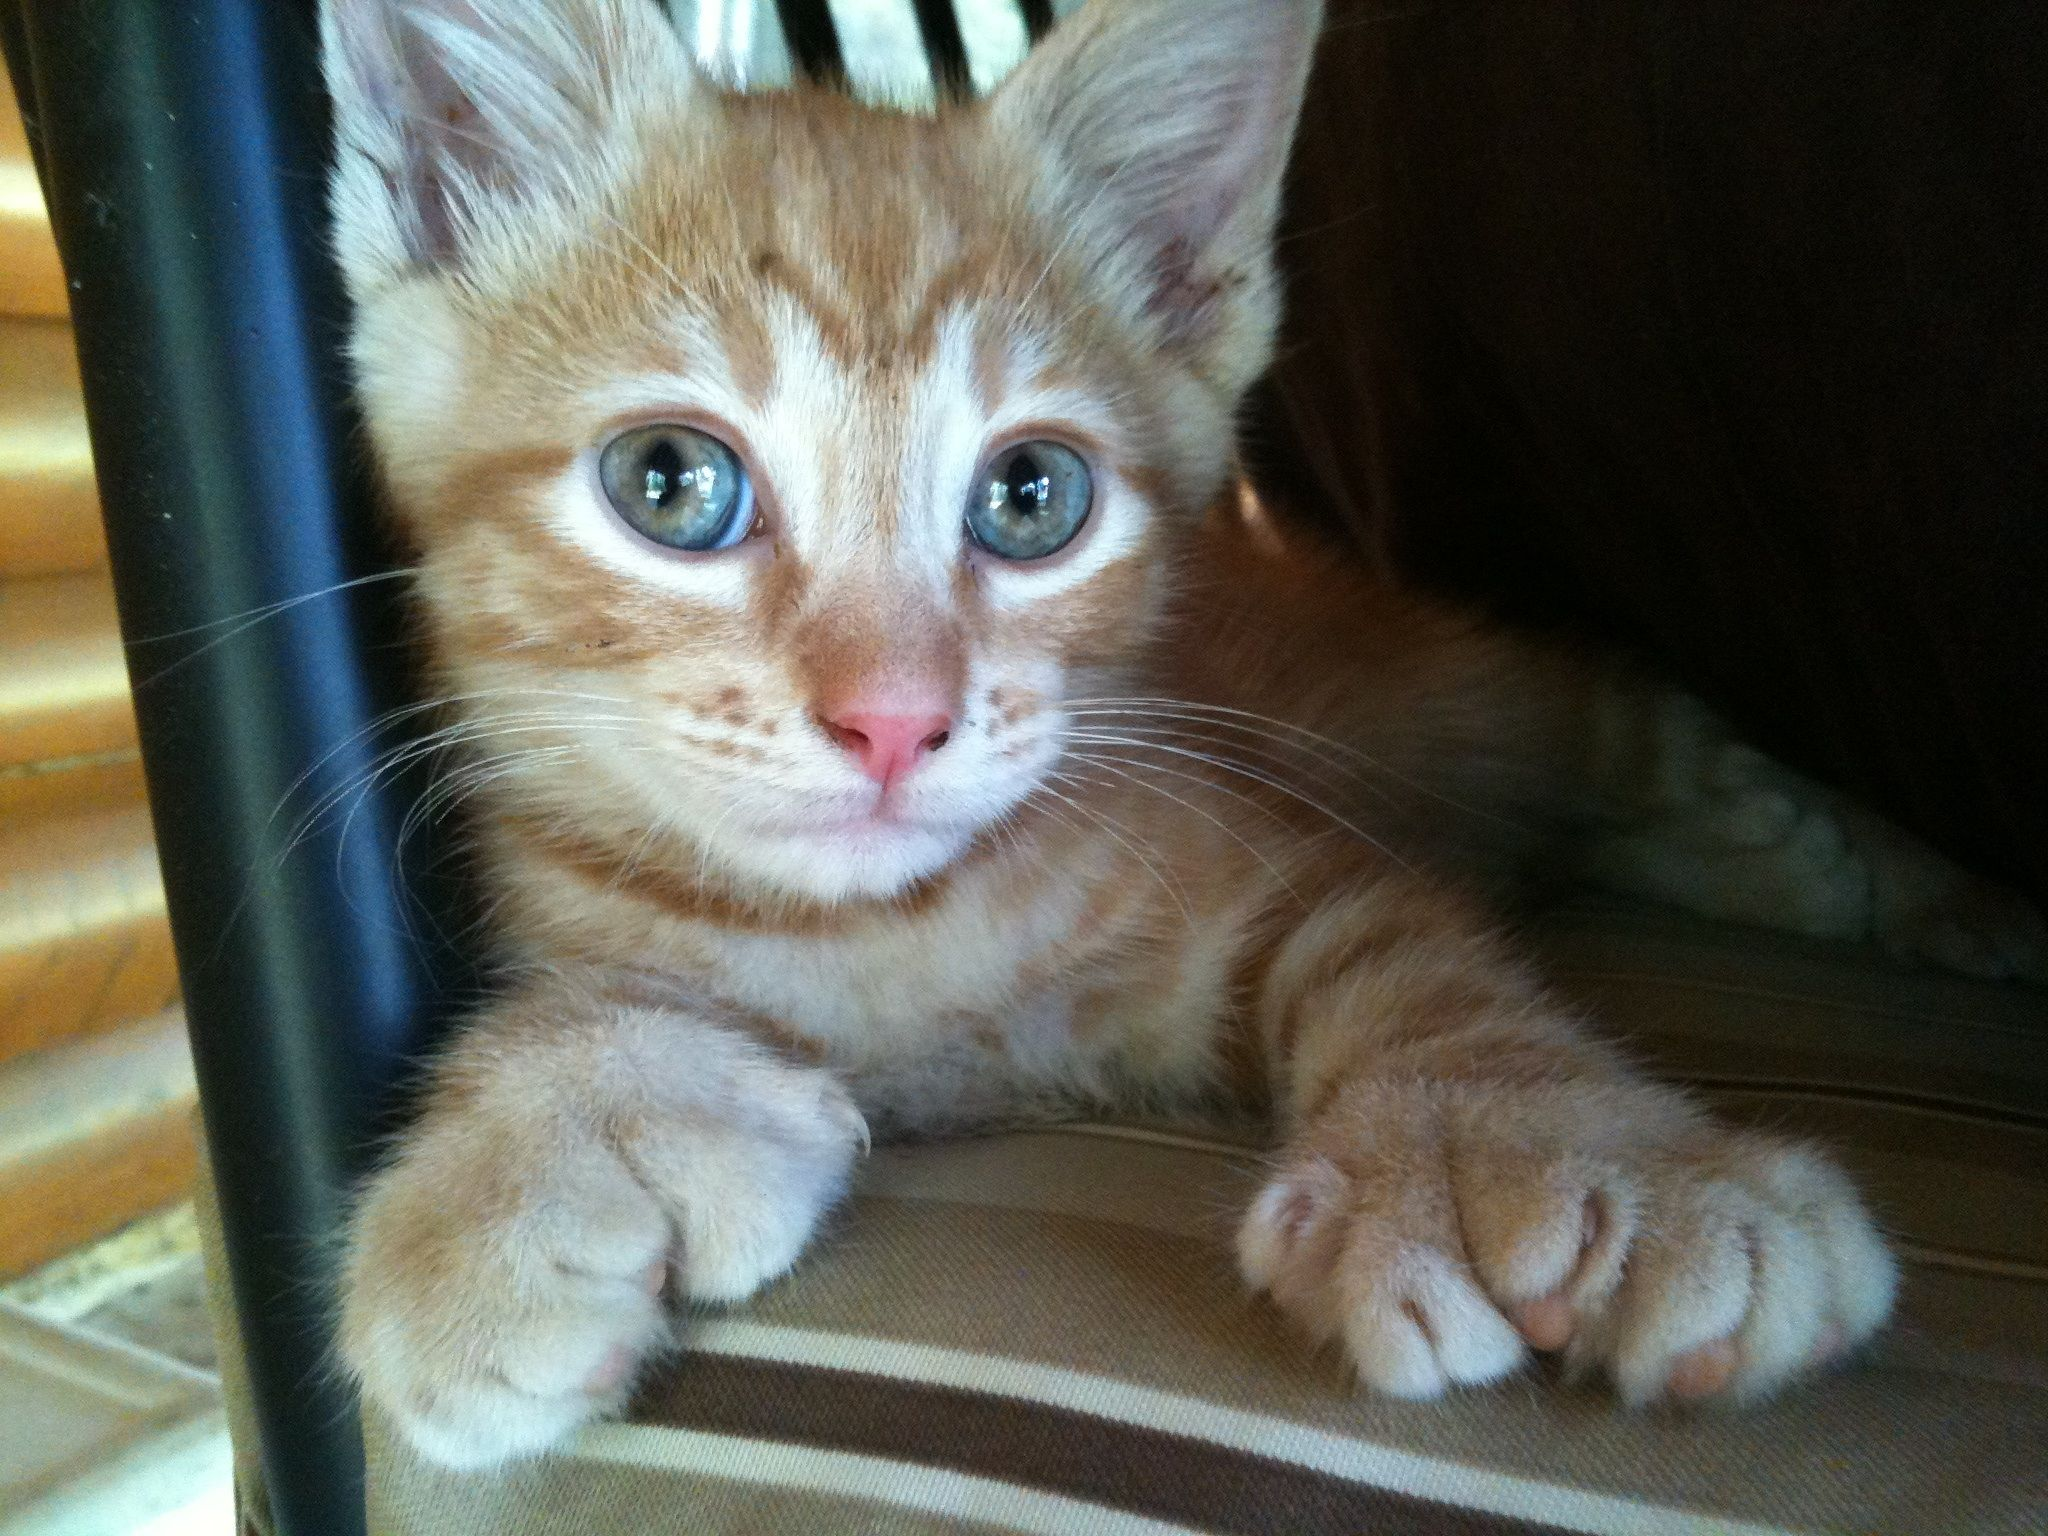 Polydactyl ;) Cat facts, Cat having kittens, Cat has fleas